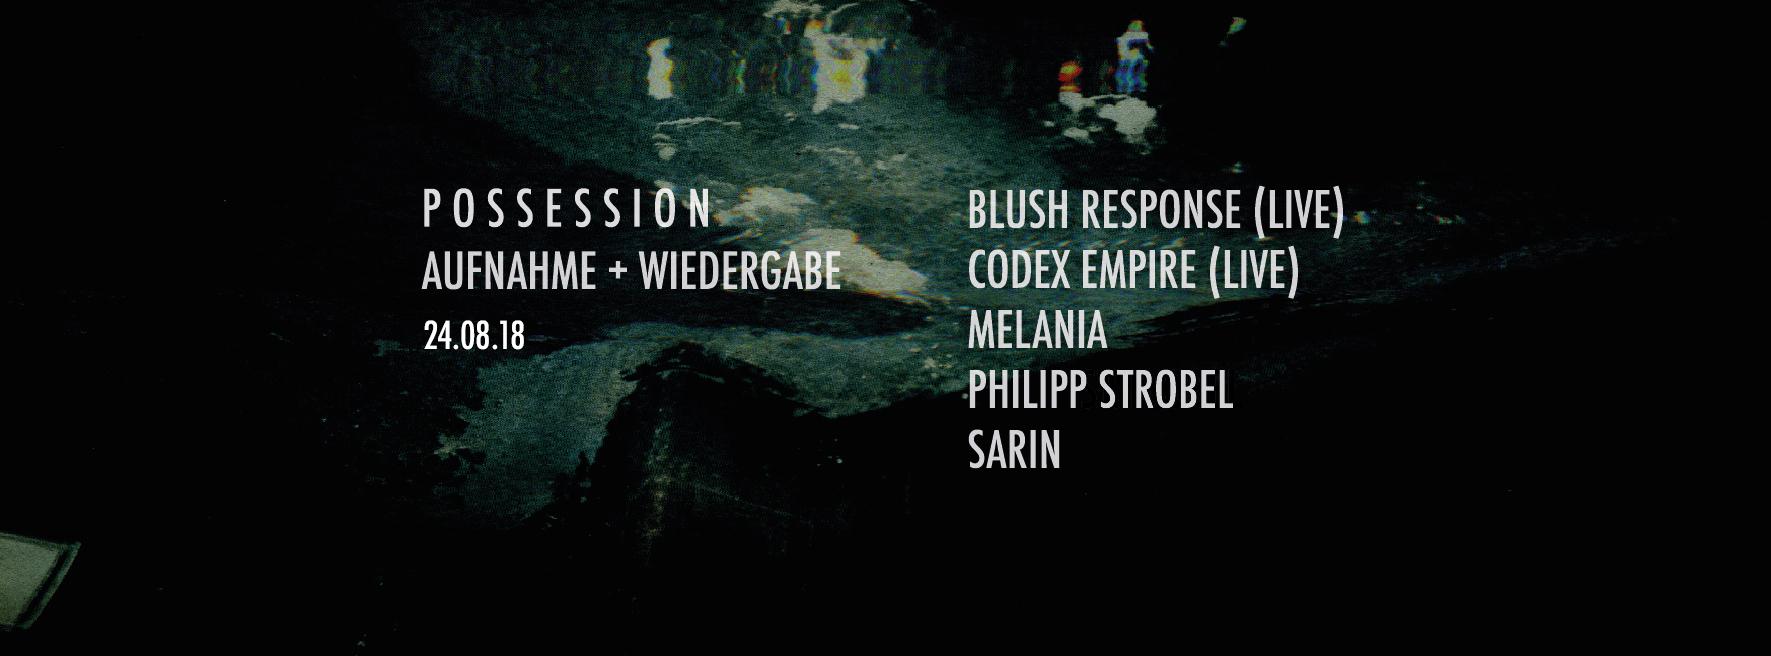 Possession invite Aufnahme+Wiedergabe